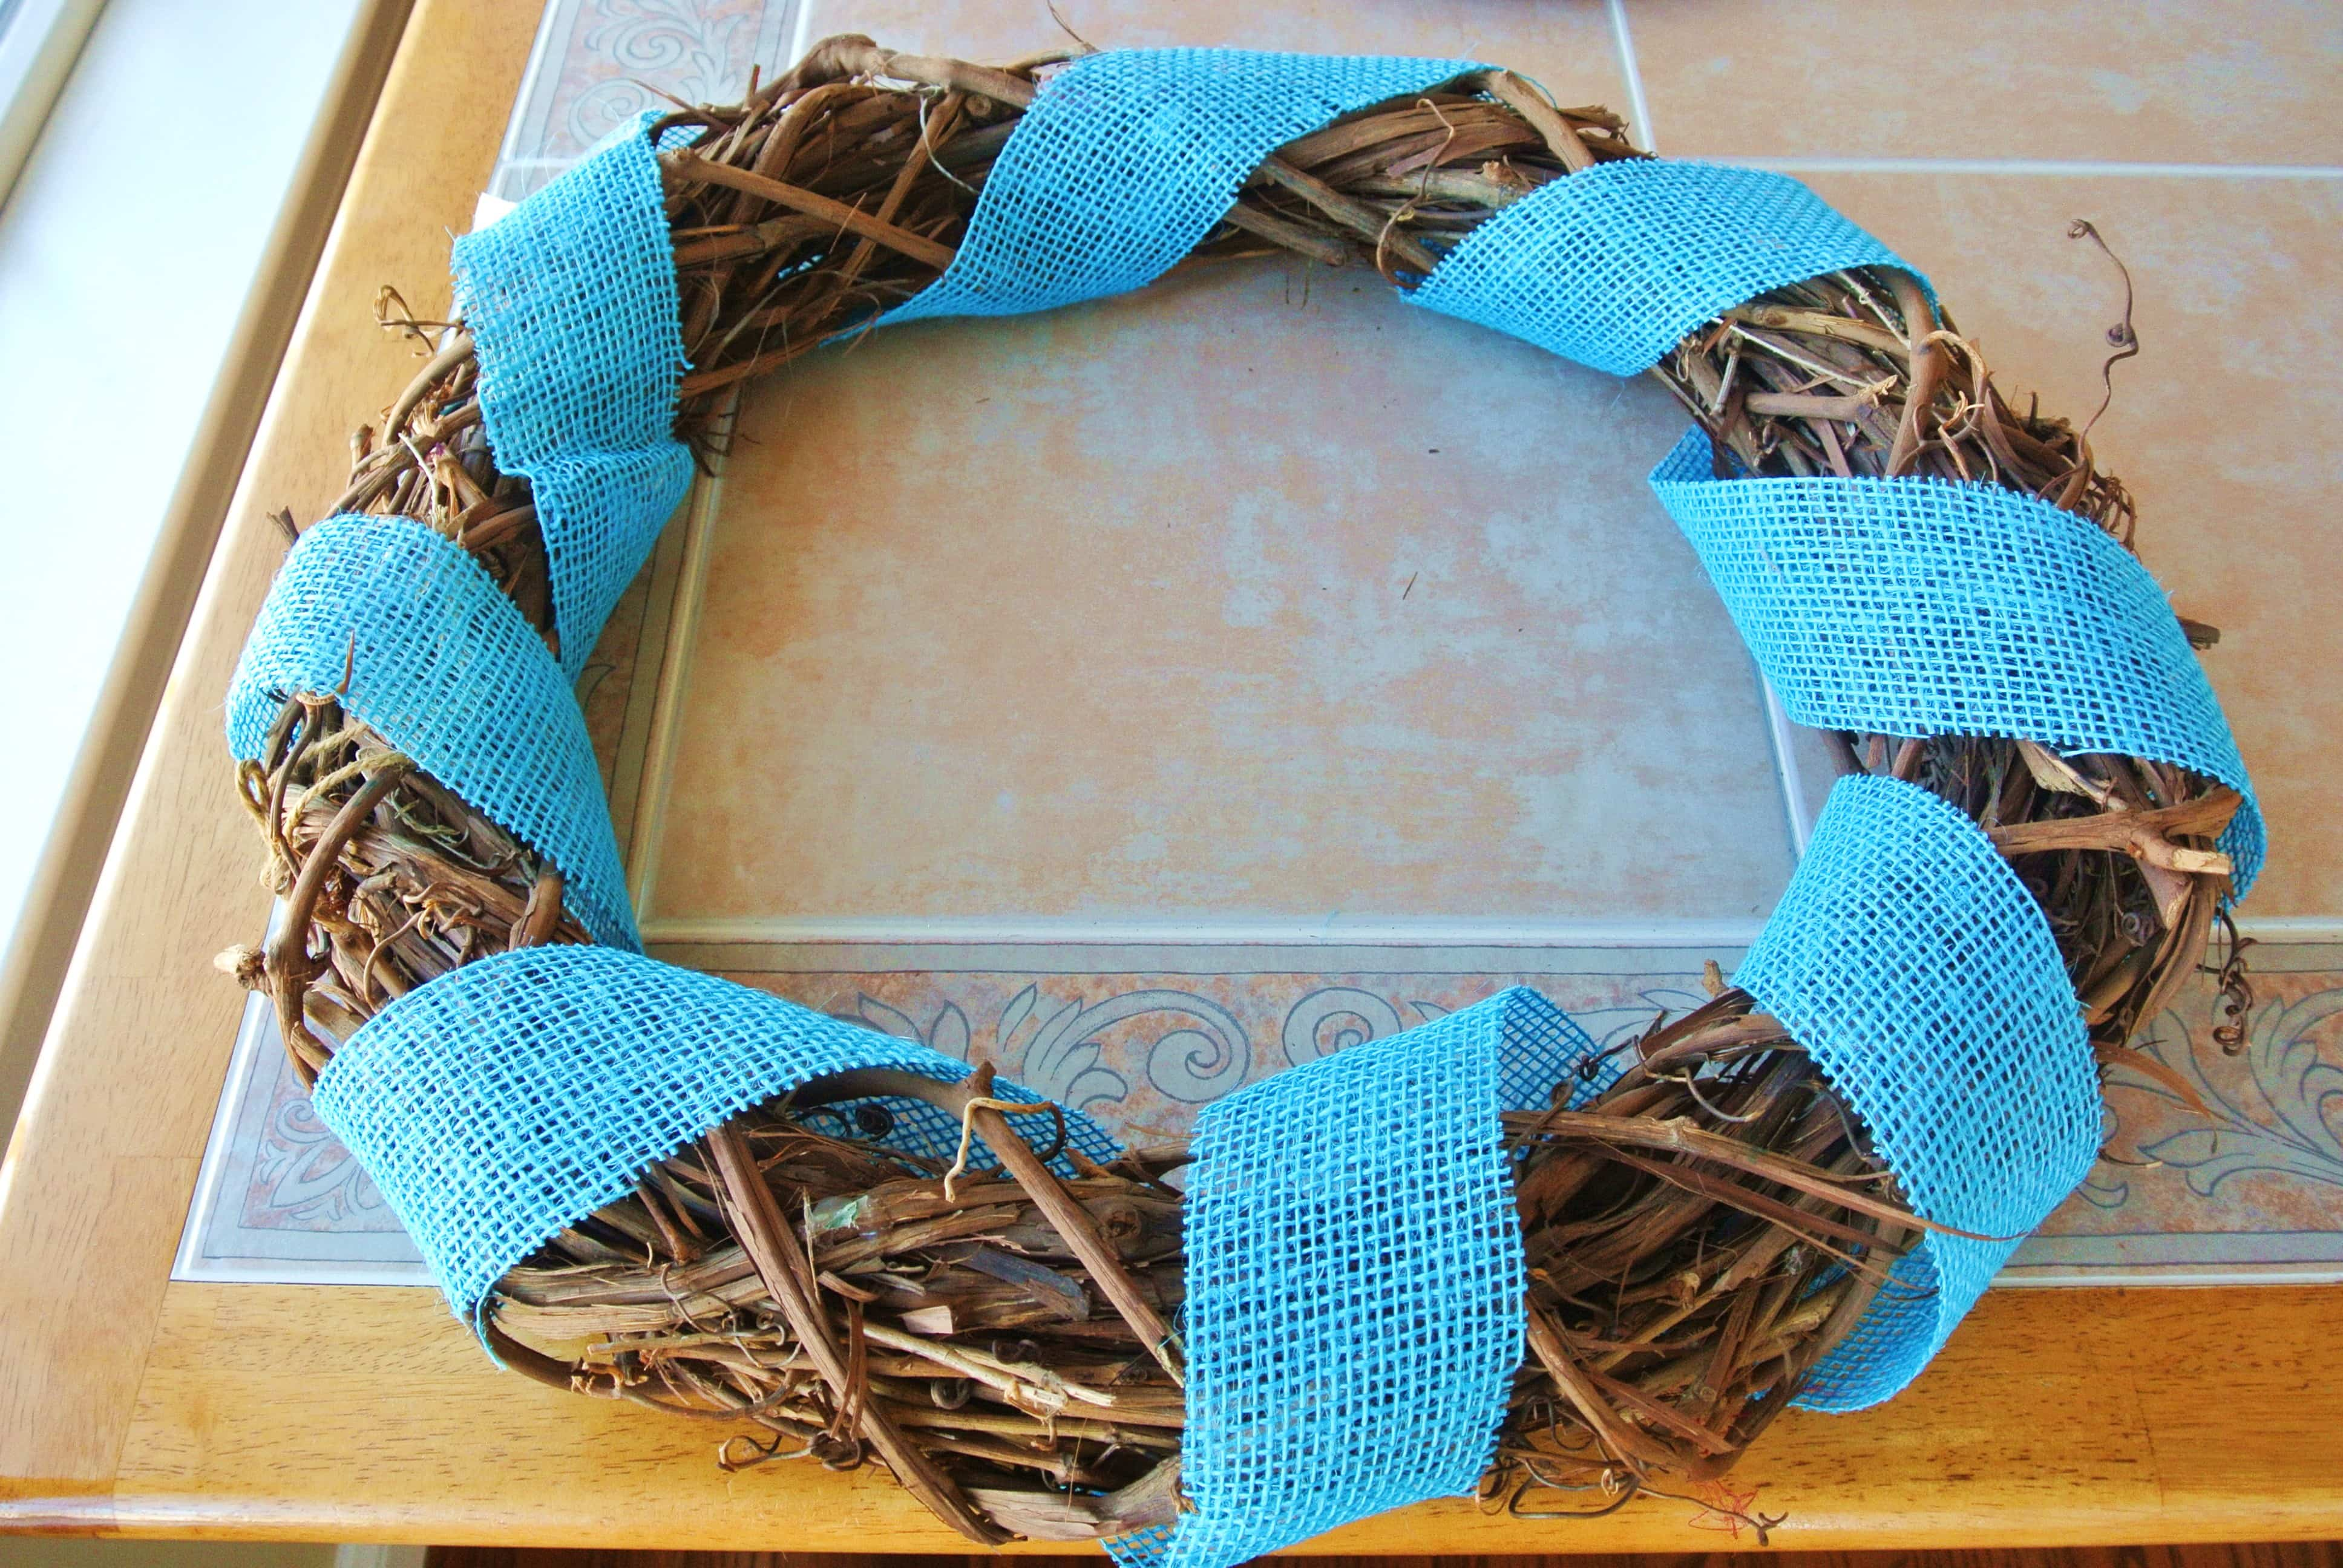 Blue burlap ribbon around wreath